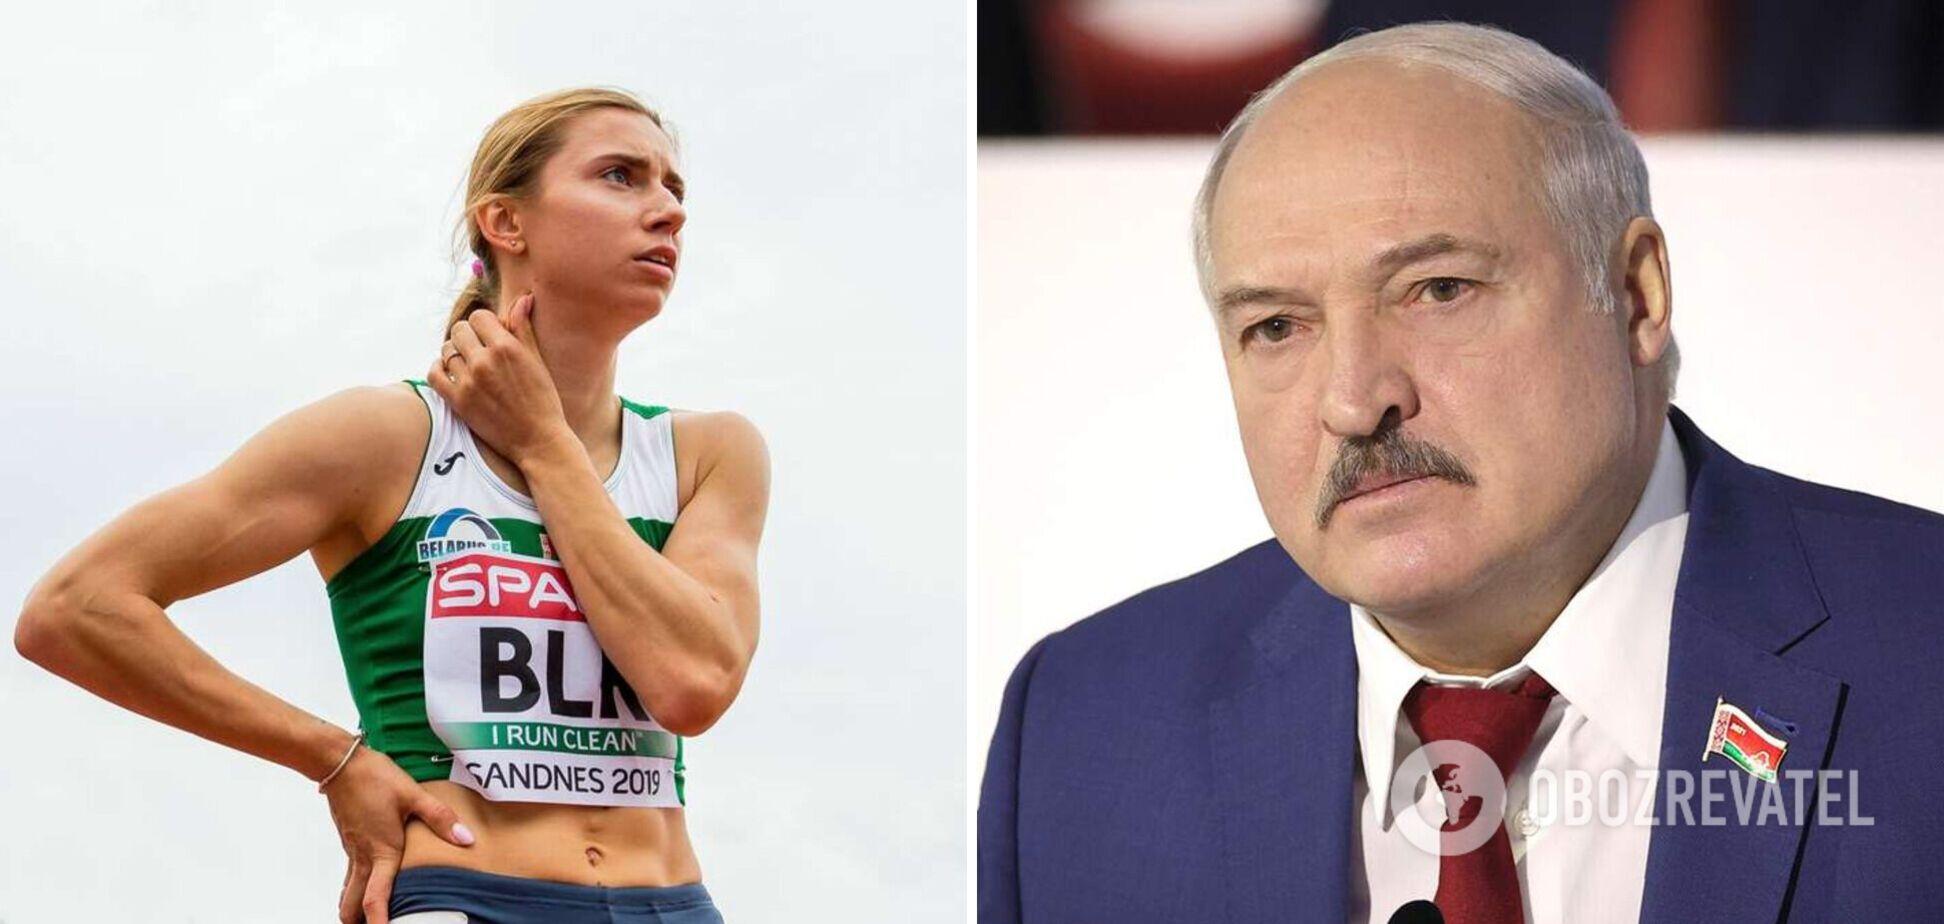 Христина Тимановська й Олександр Лукашенко